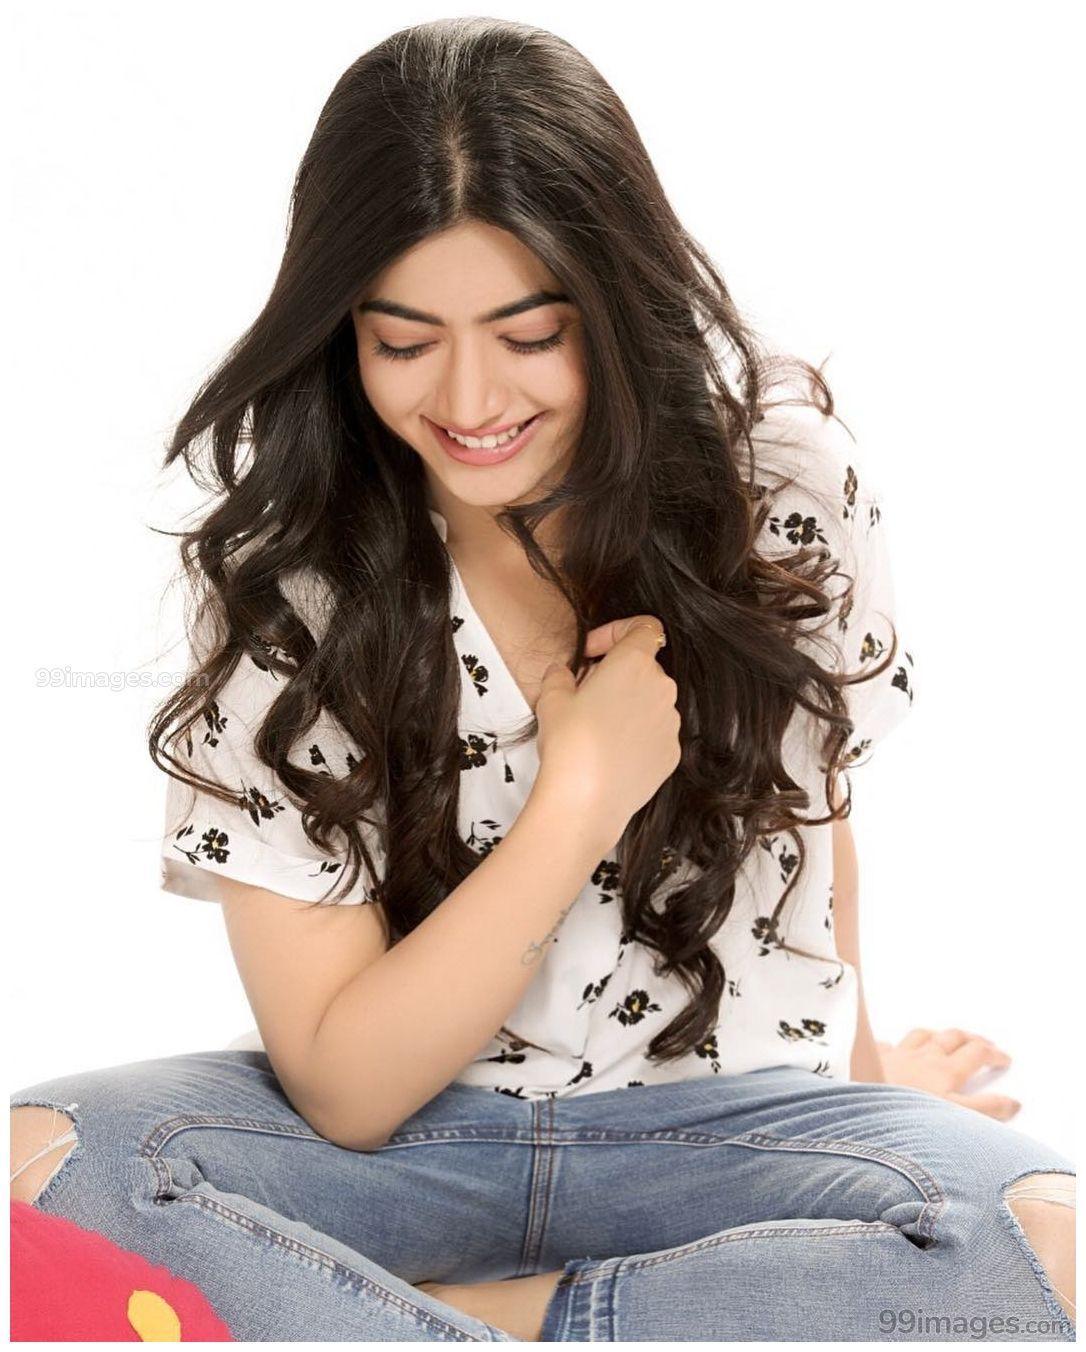 Rashmika Mandanna Beautiful Hd Photos Mobile Wallpapers Hd Android Iphone 1080p 28873 Rashmi Stylish Girl Images Beauty Girl Beautiful Indian Actress